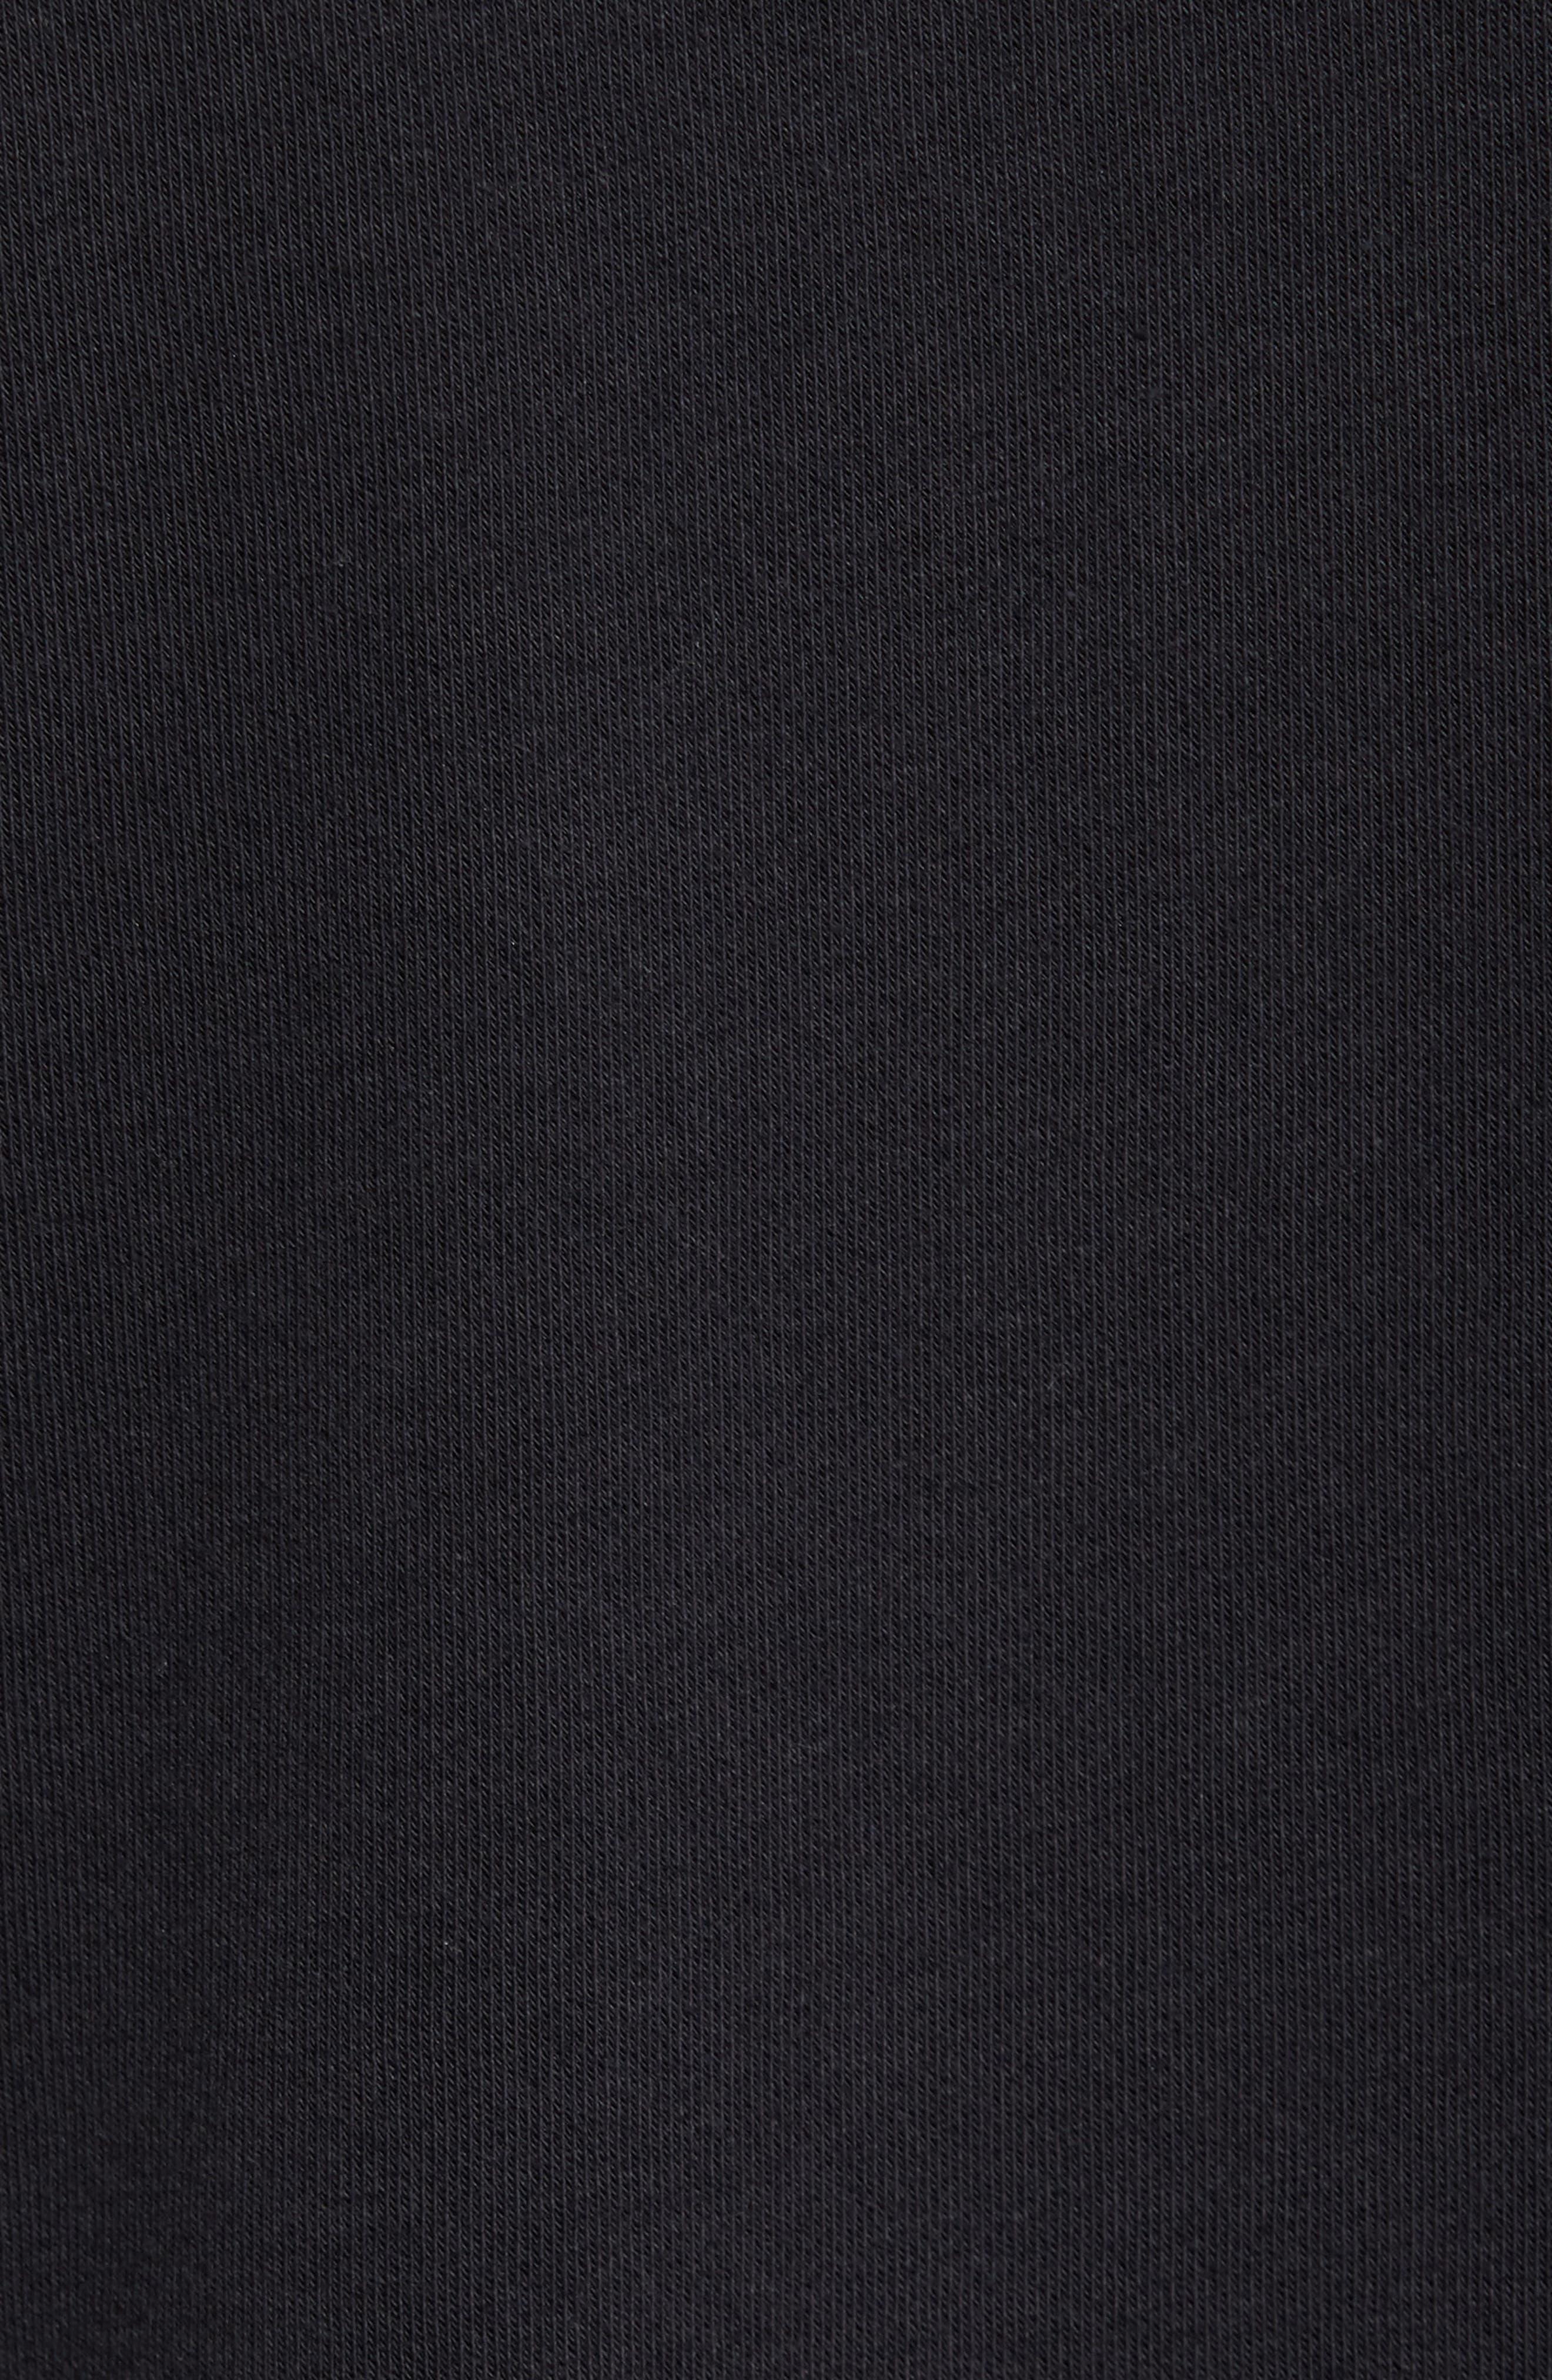 NSW AF1 Hoodie,                             Alternate thumbnail 6, color,                             BLACK/ ANTHRACITE